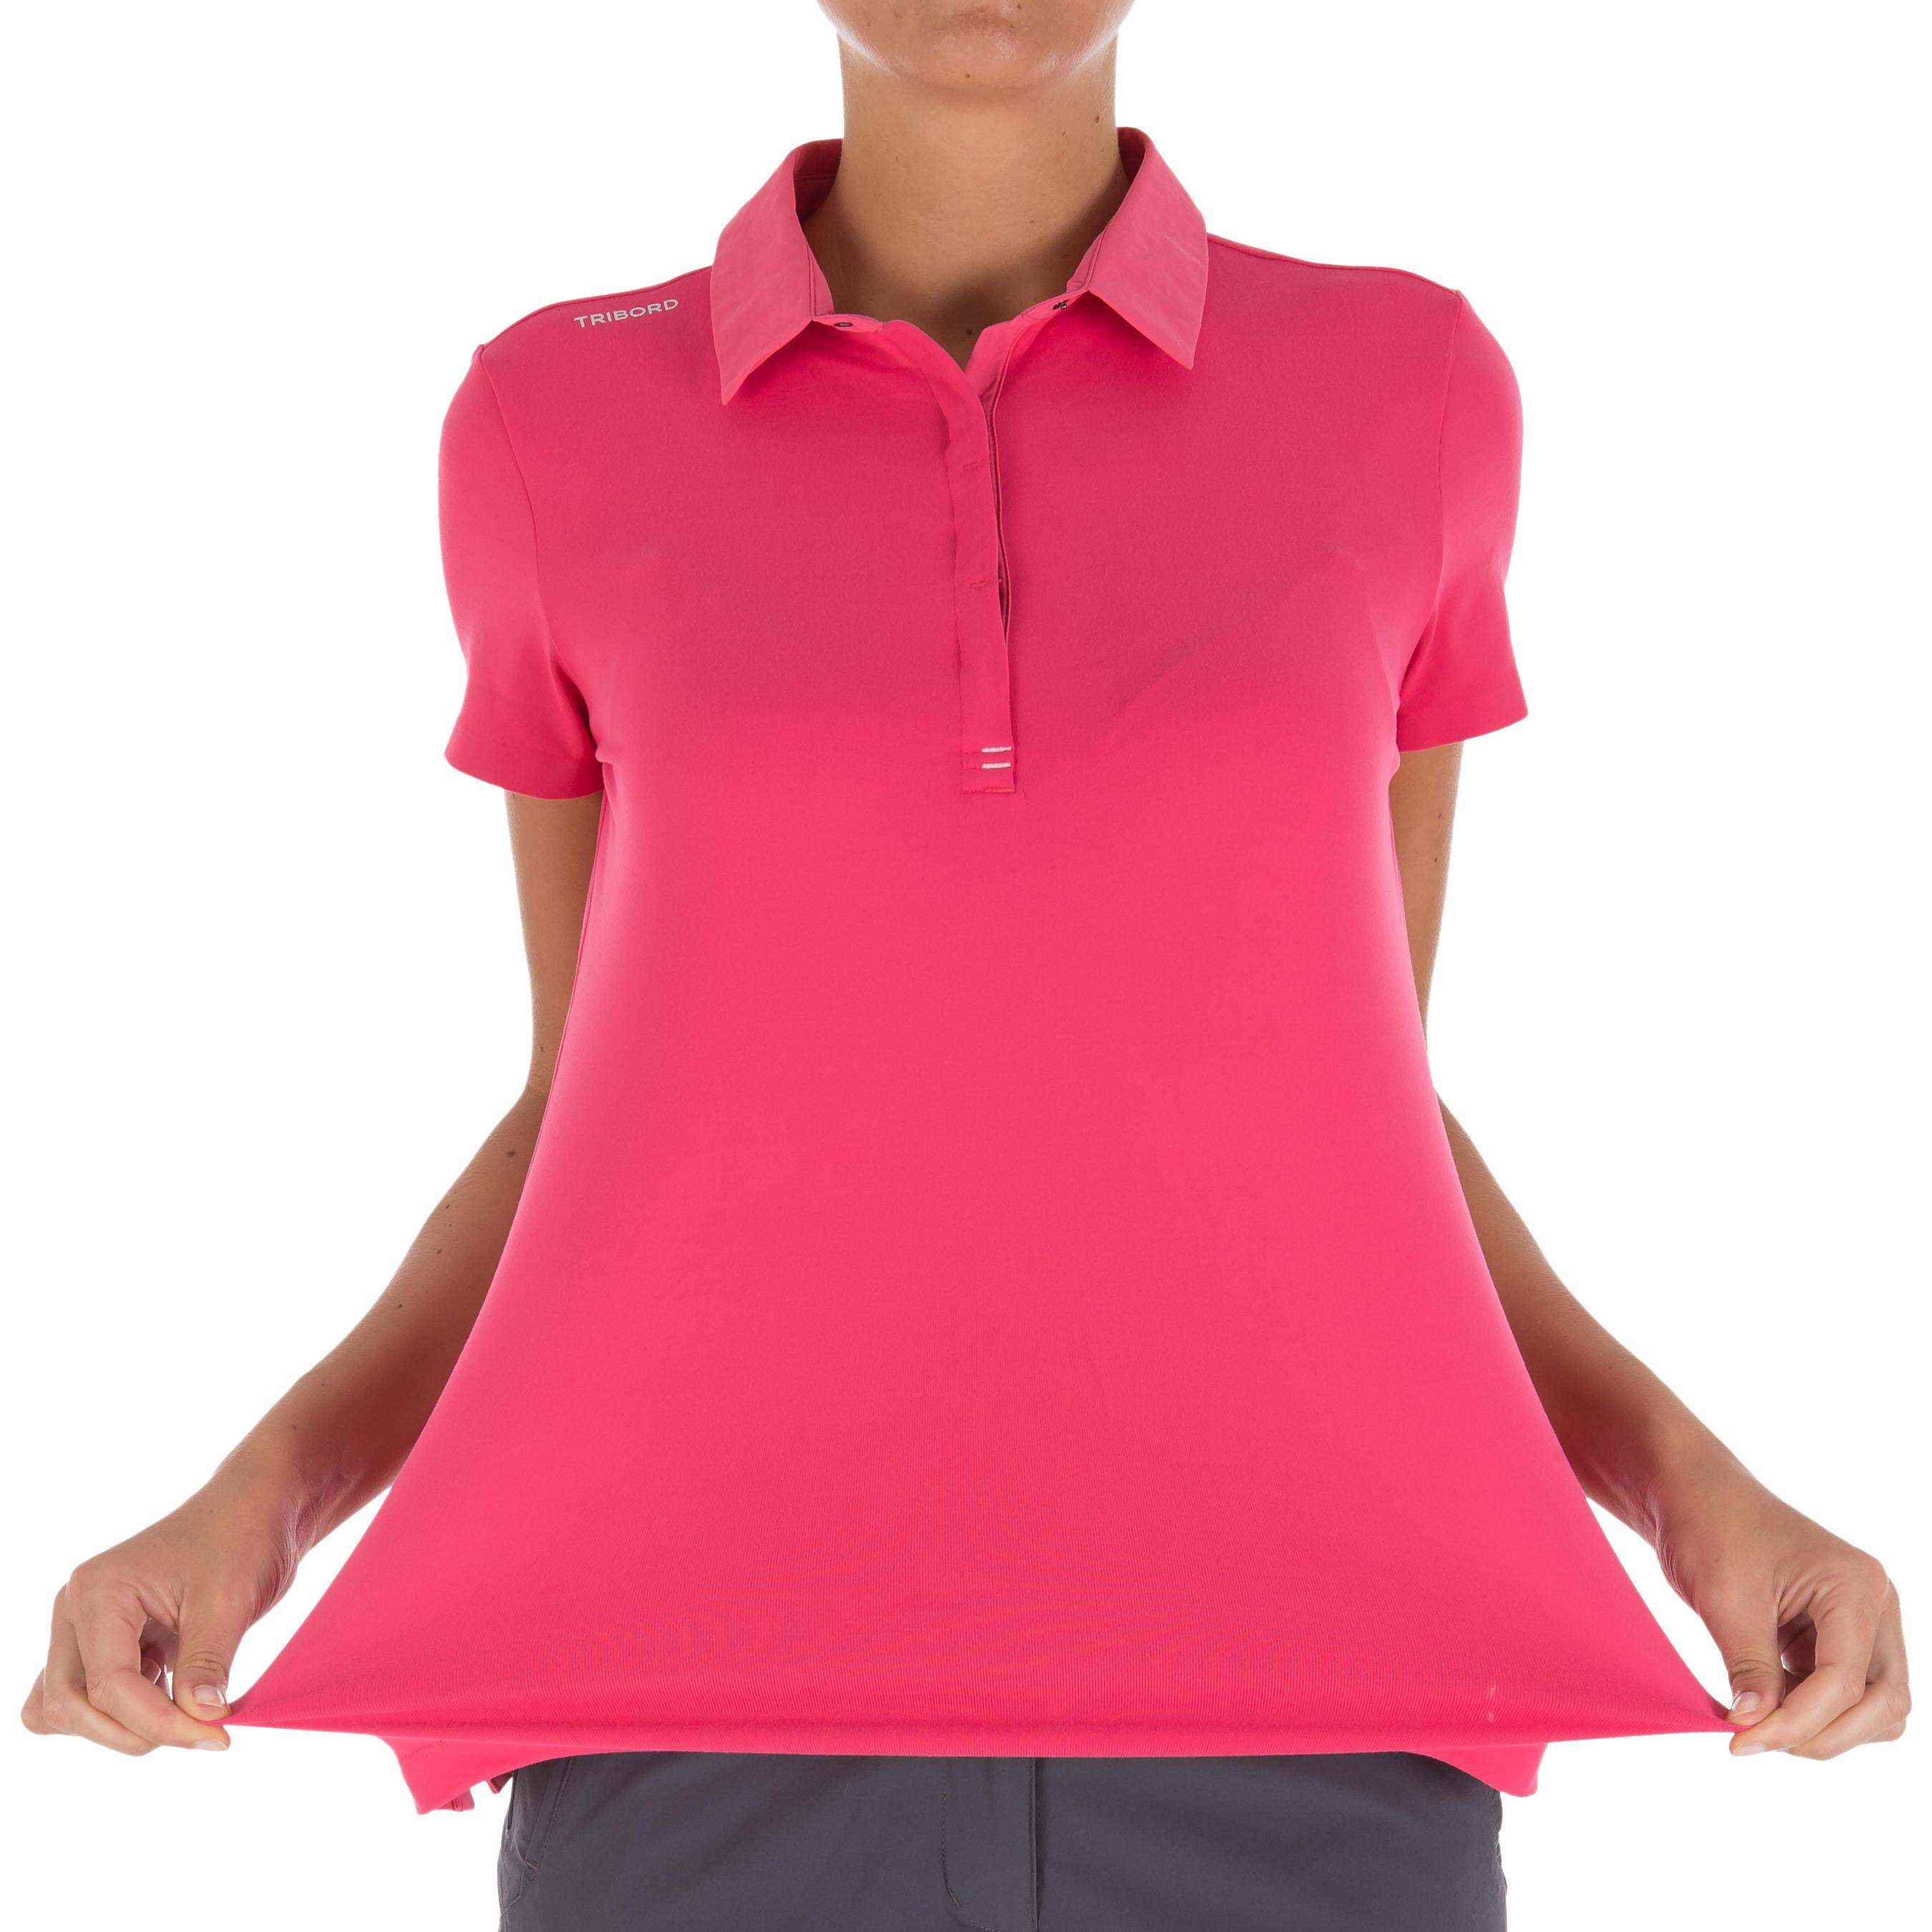 Women's Race short-sleeved sailing polo shirt pink